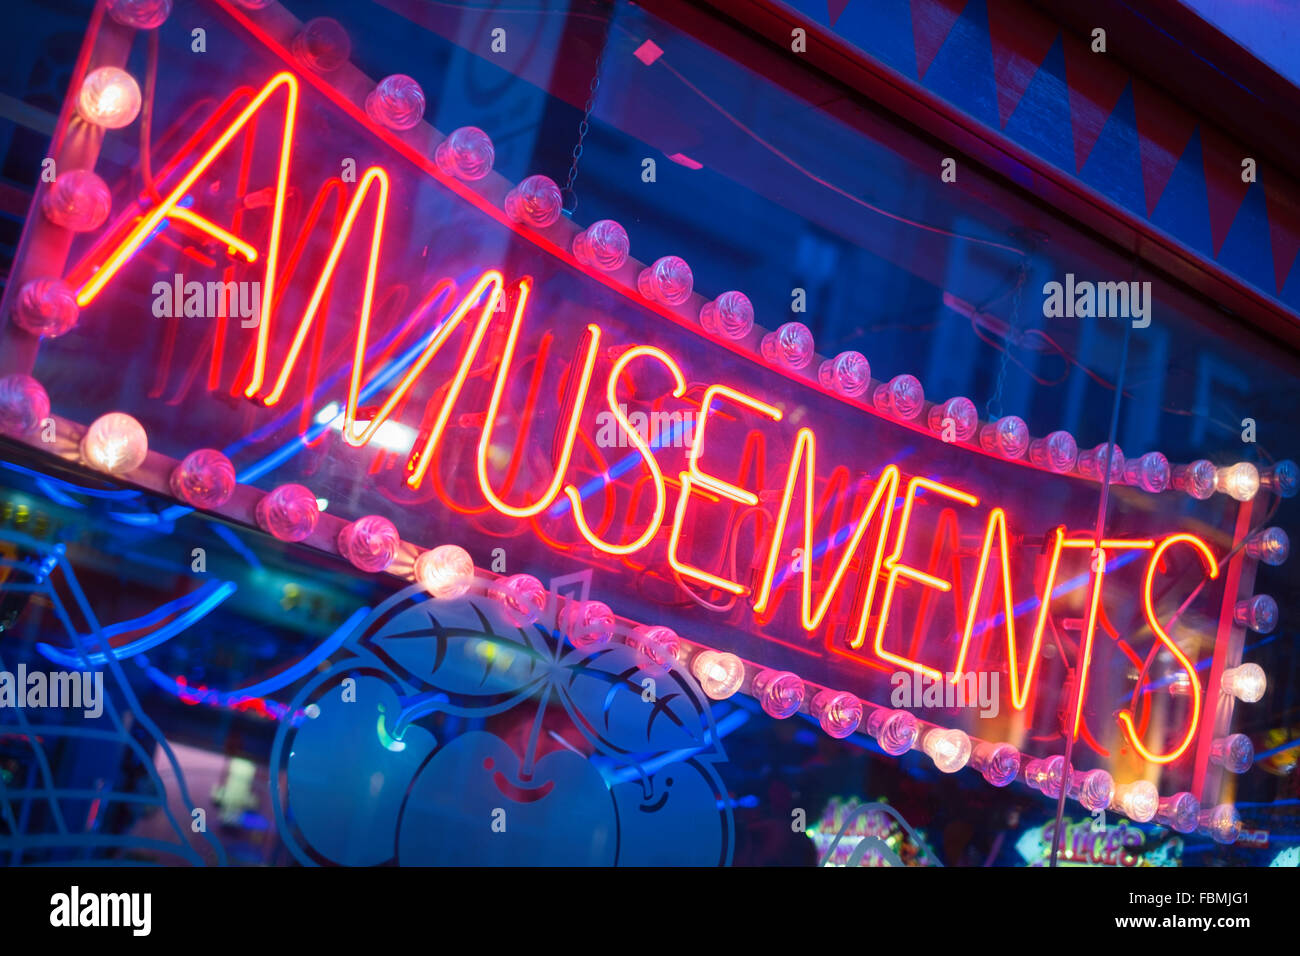 Amusements neon sign Soho London UK - Stock Image